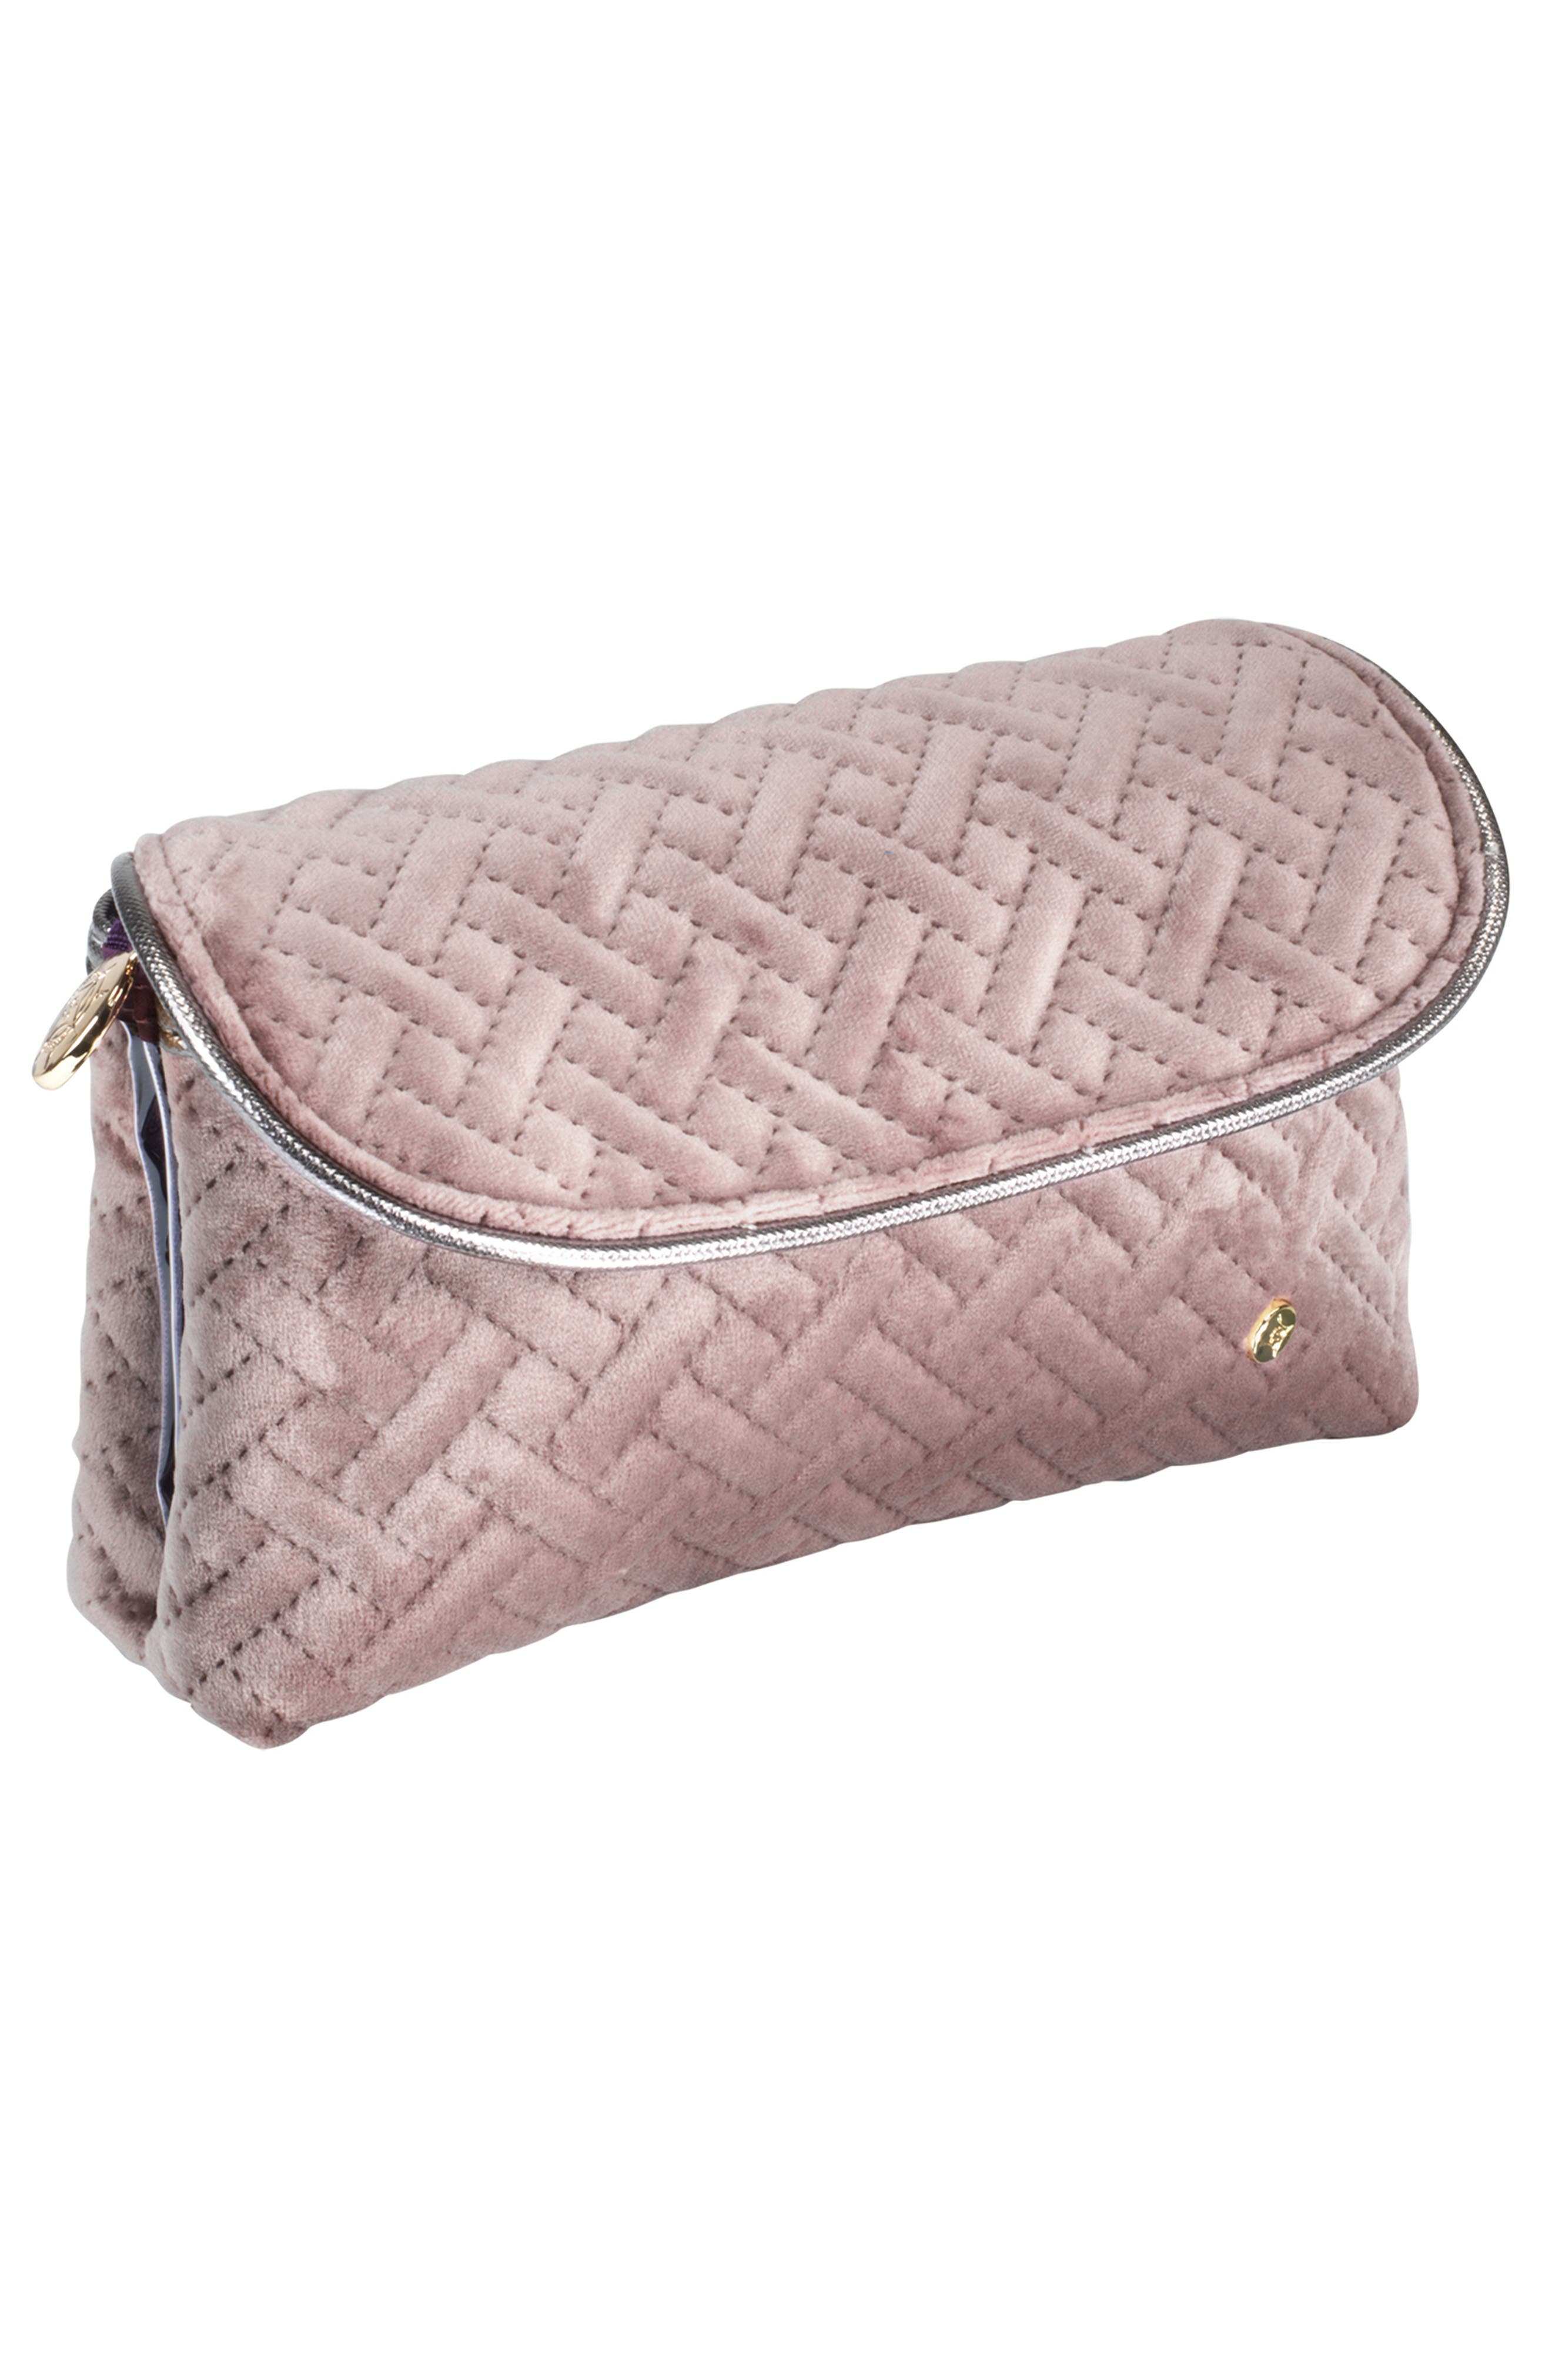 Stephanie Johnson Katie Folding Cosmetic Bag - Dusty Plum